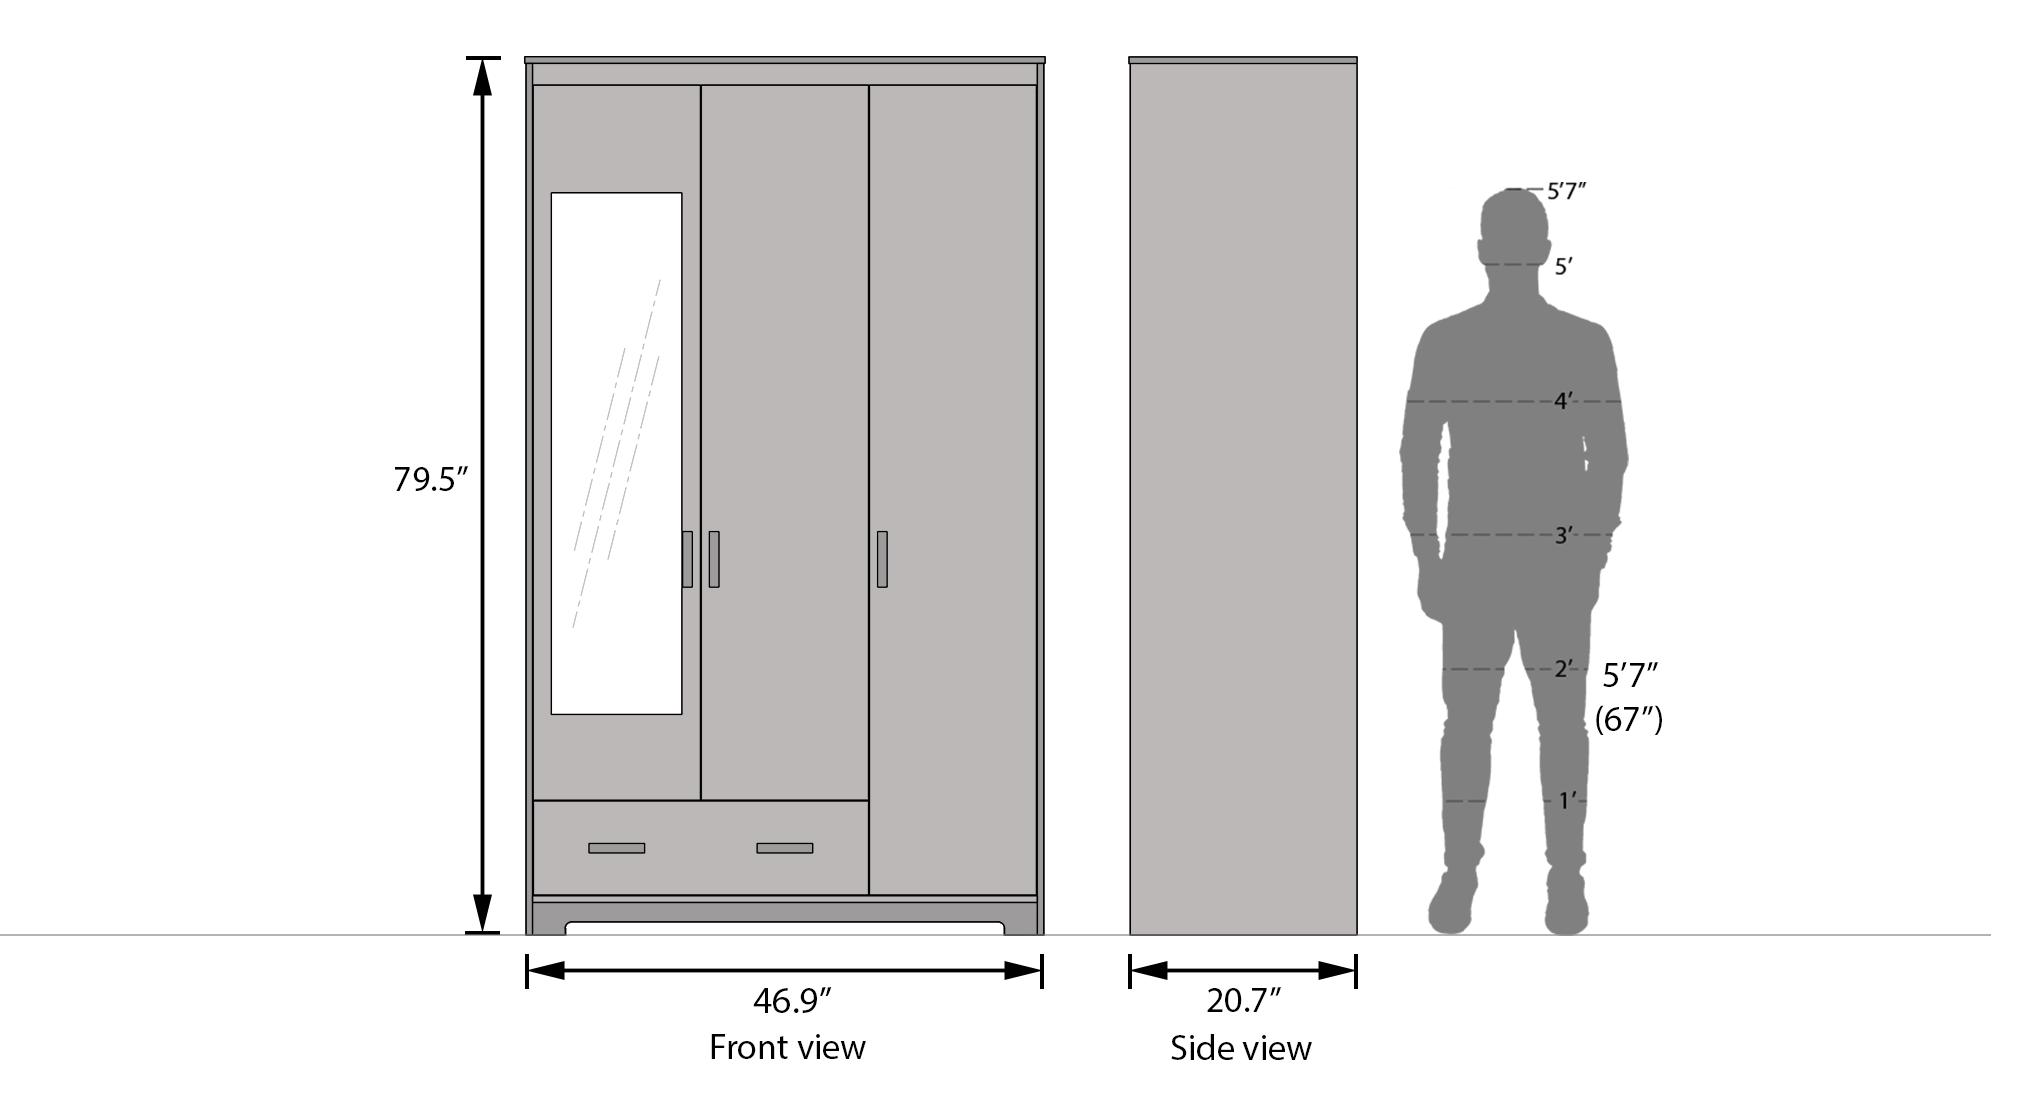 Hilton 3 door wardrobe 1 drawer dimension 1